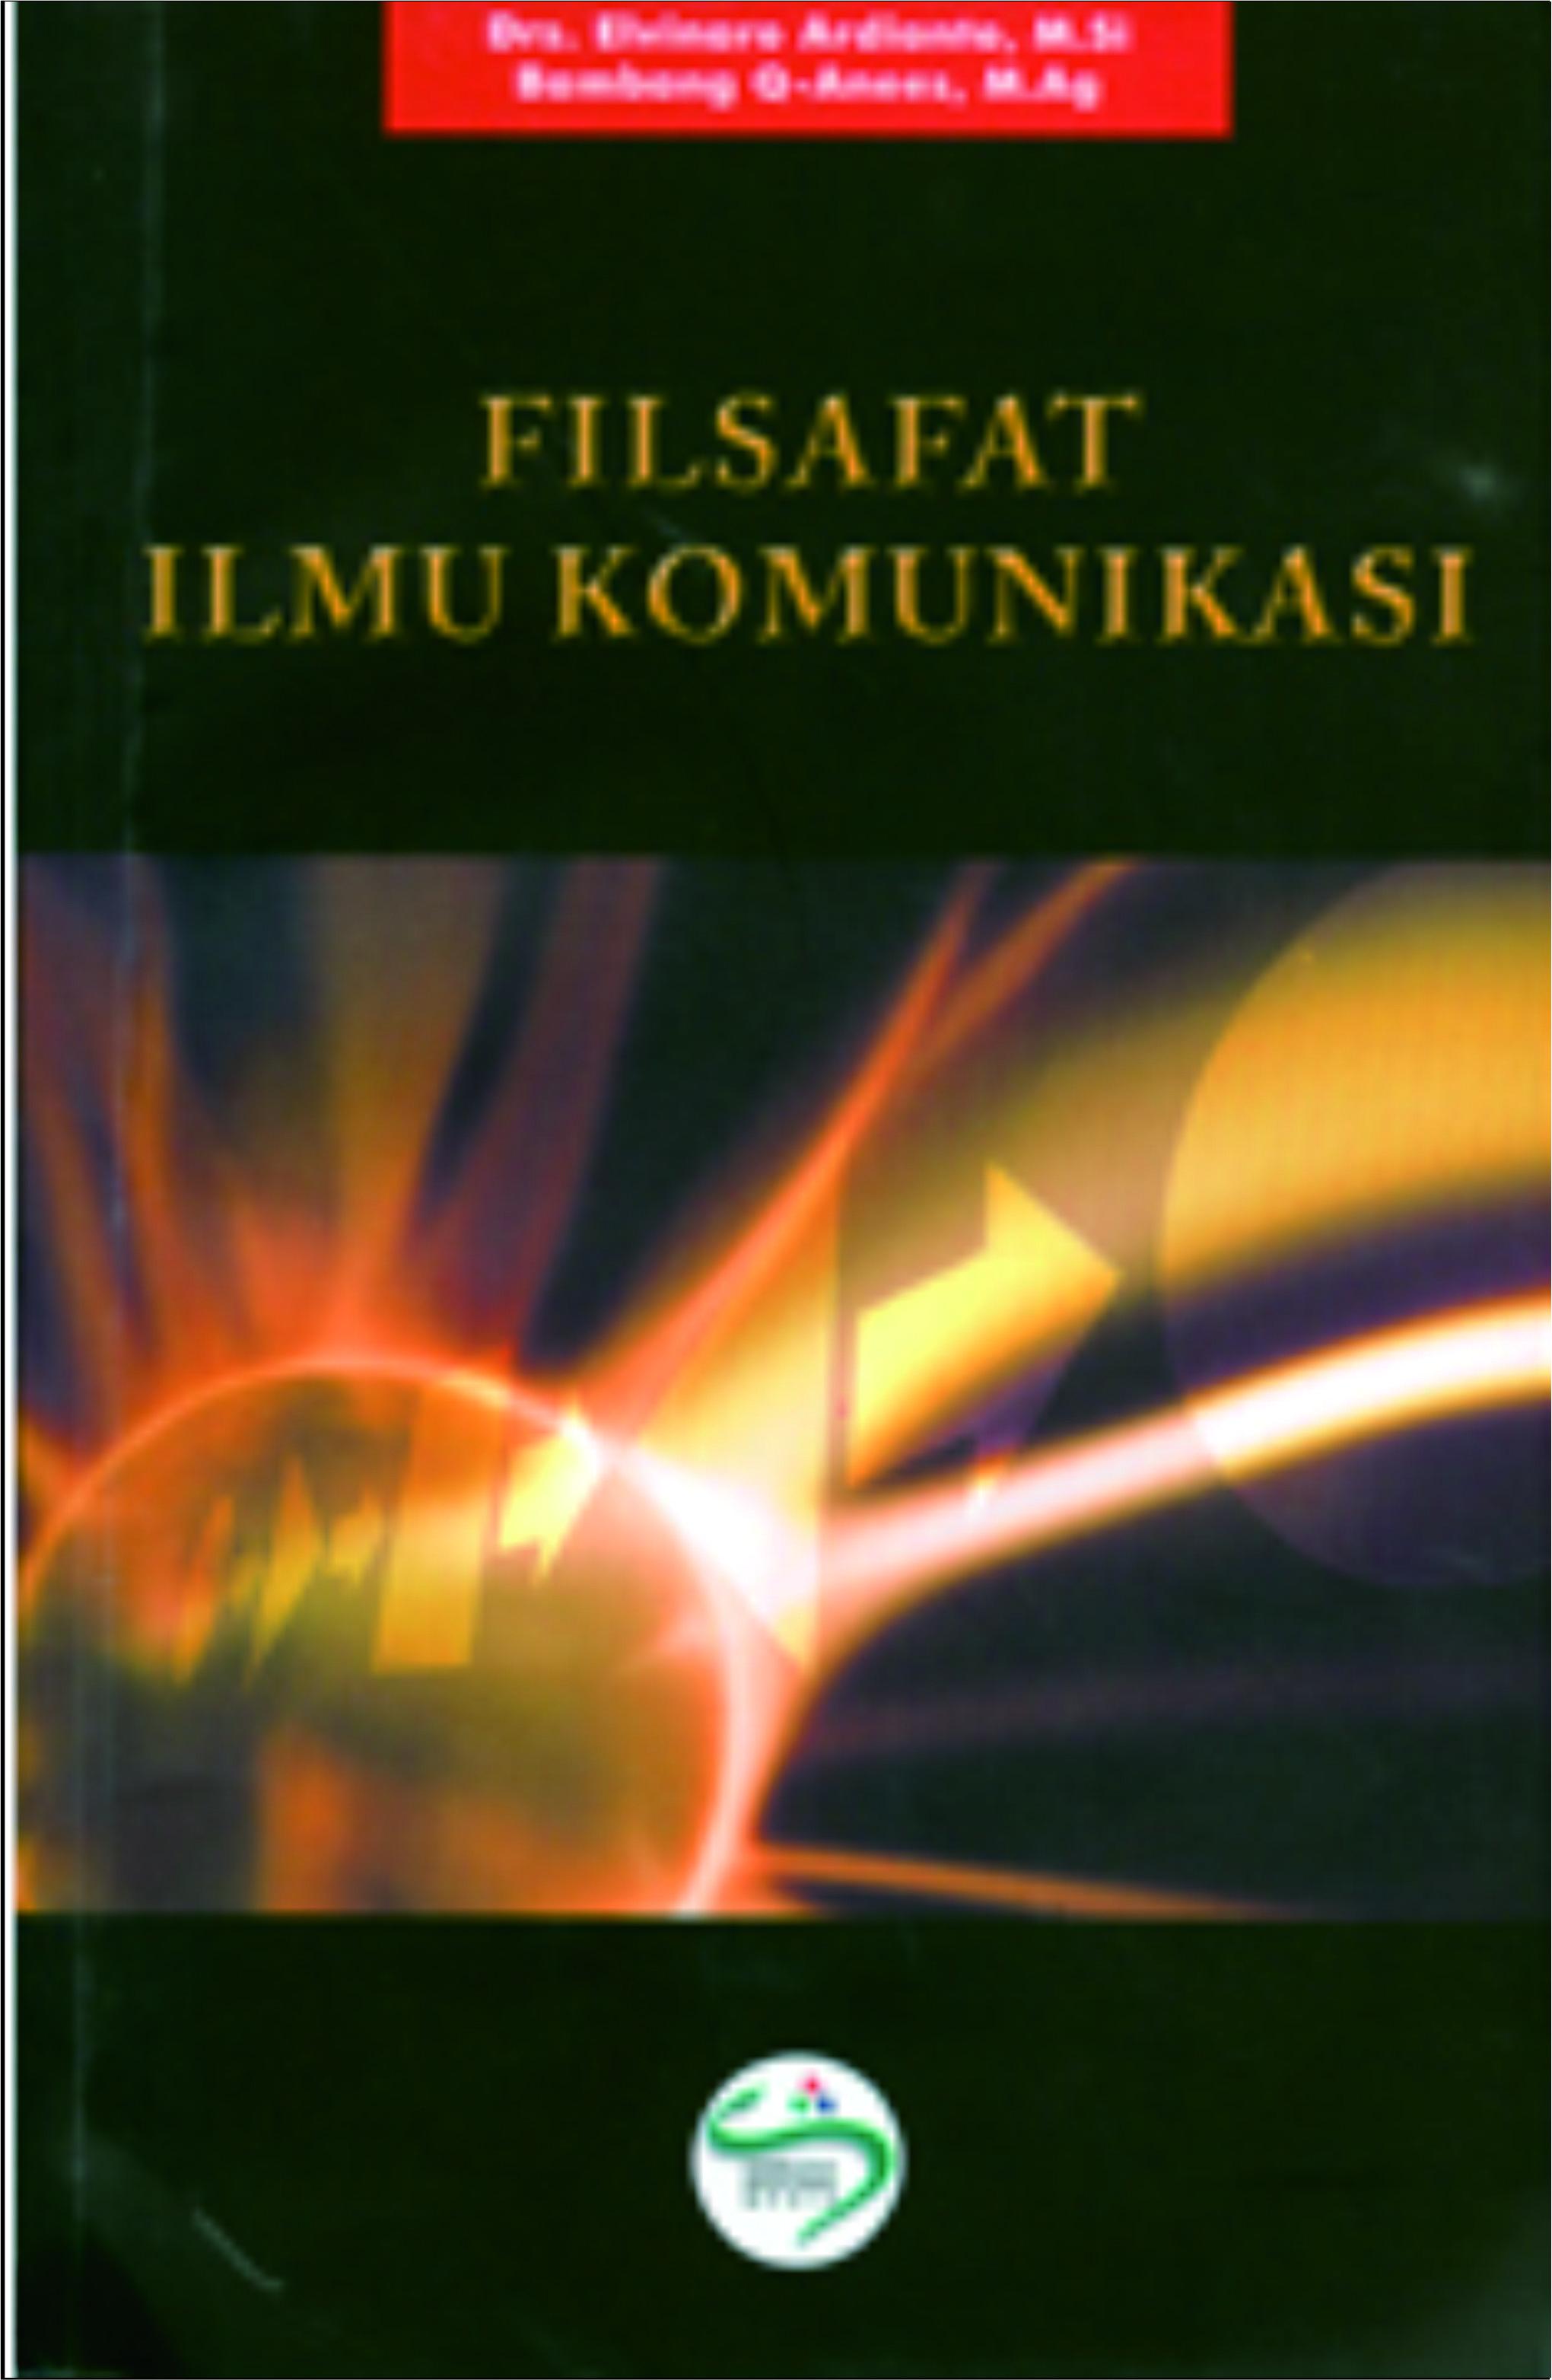 Filsafat Ilmu Komunikasi - Universitas Padjadjaran